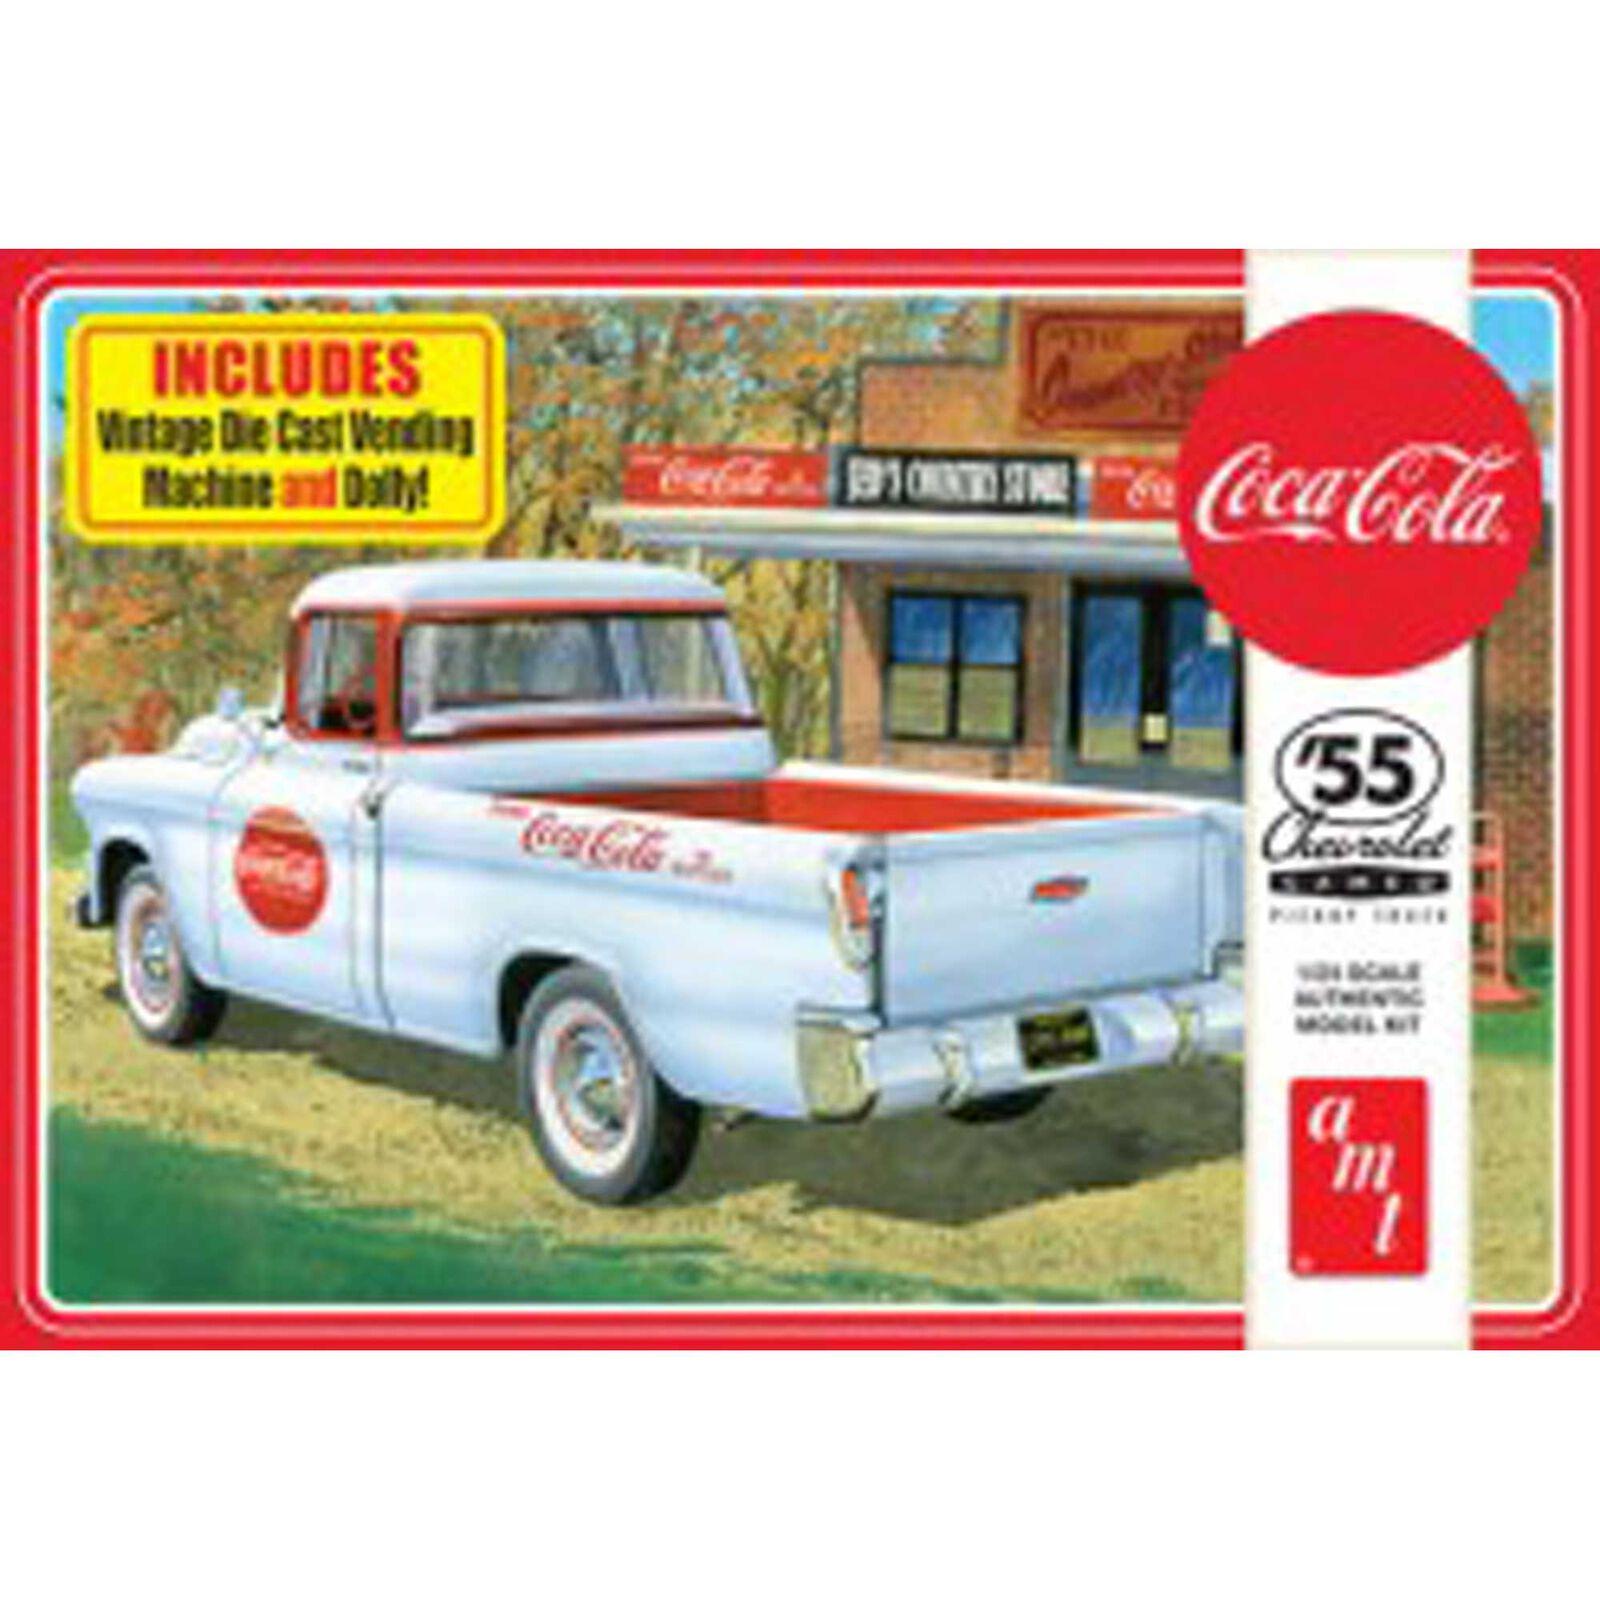 1/25, 1955 Chevy Cameo Pickup Coca-Cola, Model Kit